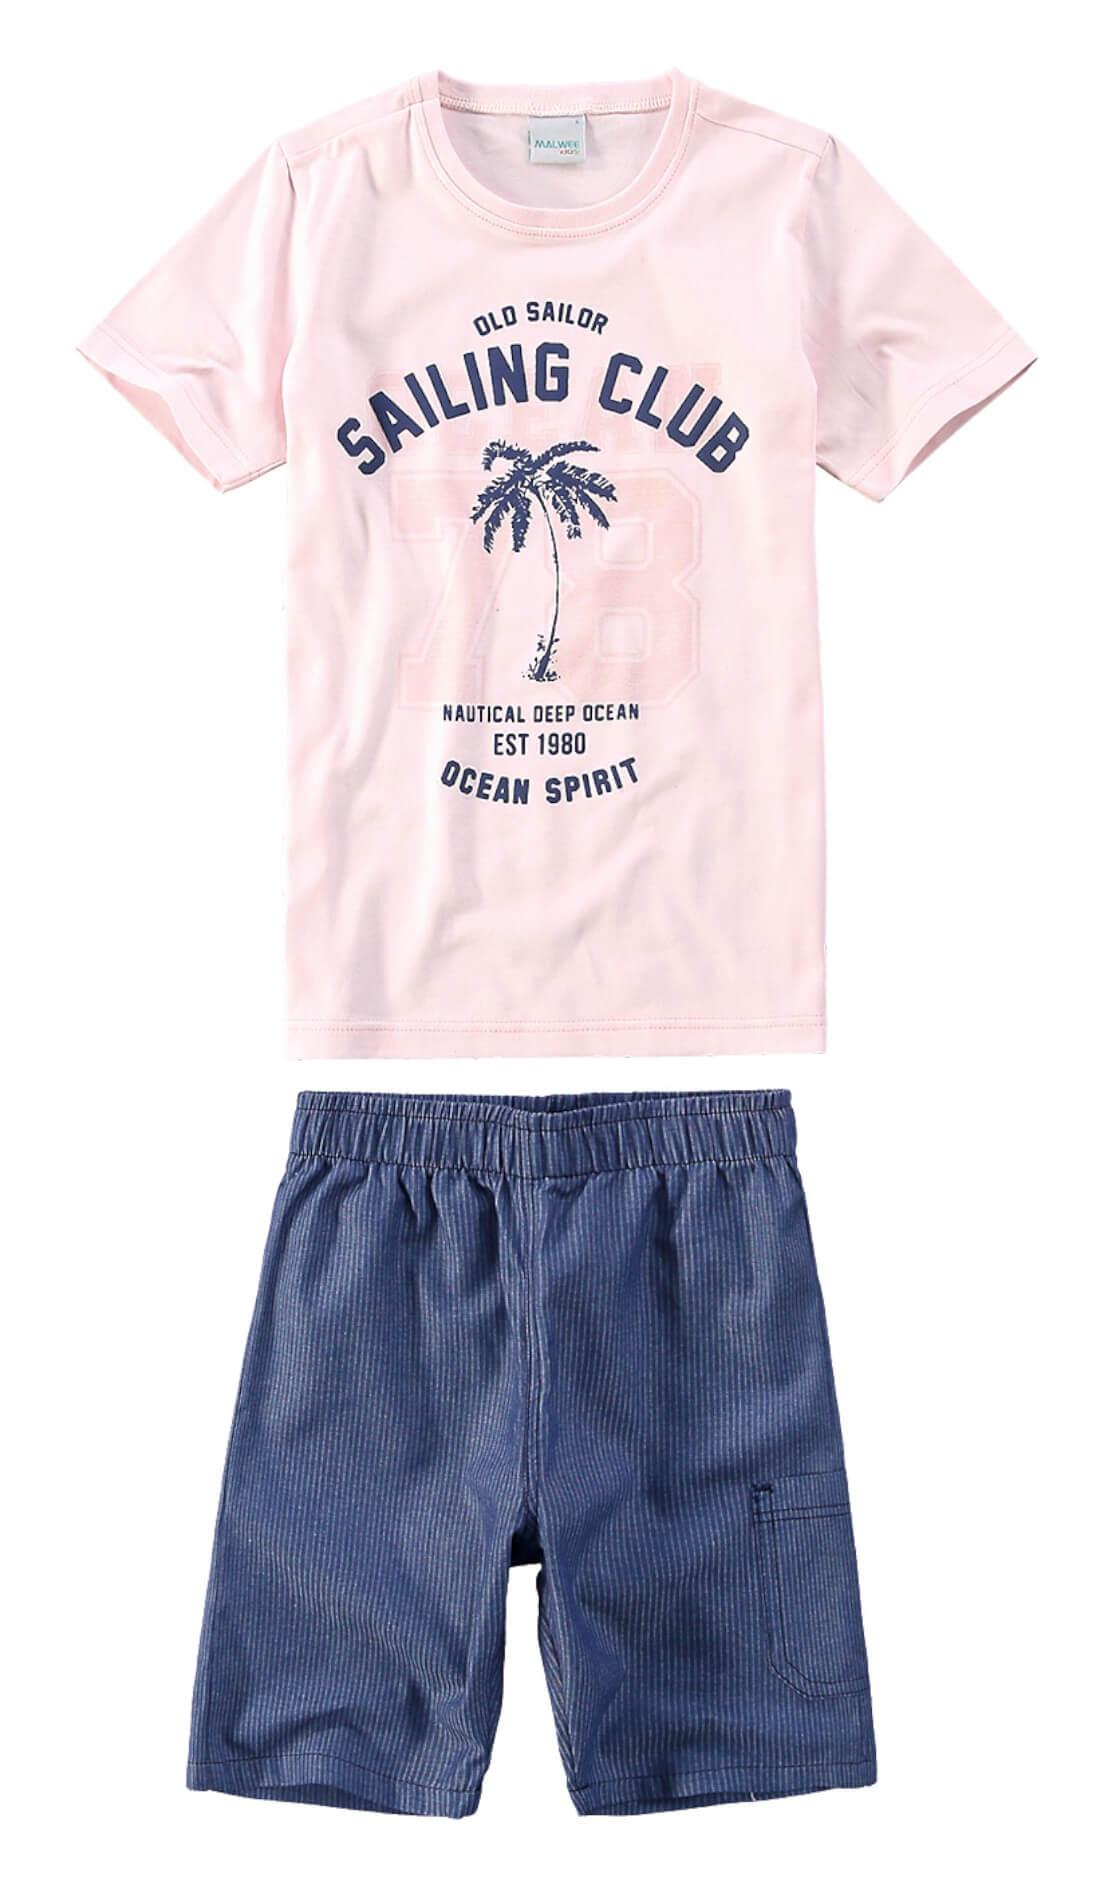 92c13fc4d Conjunto Infantil Masculino Rosa Sailing Club Malwee